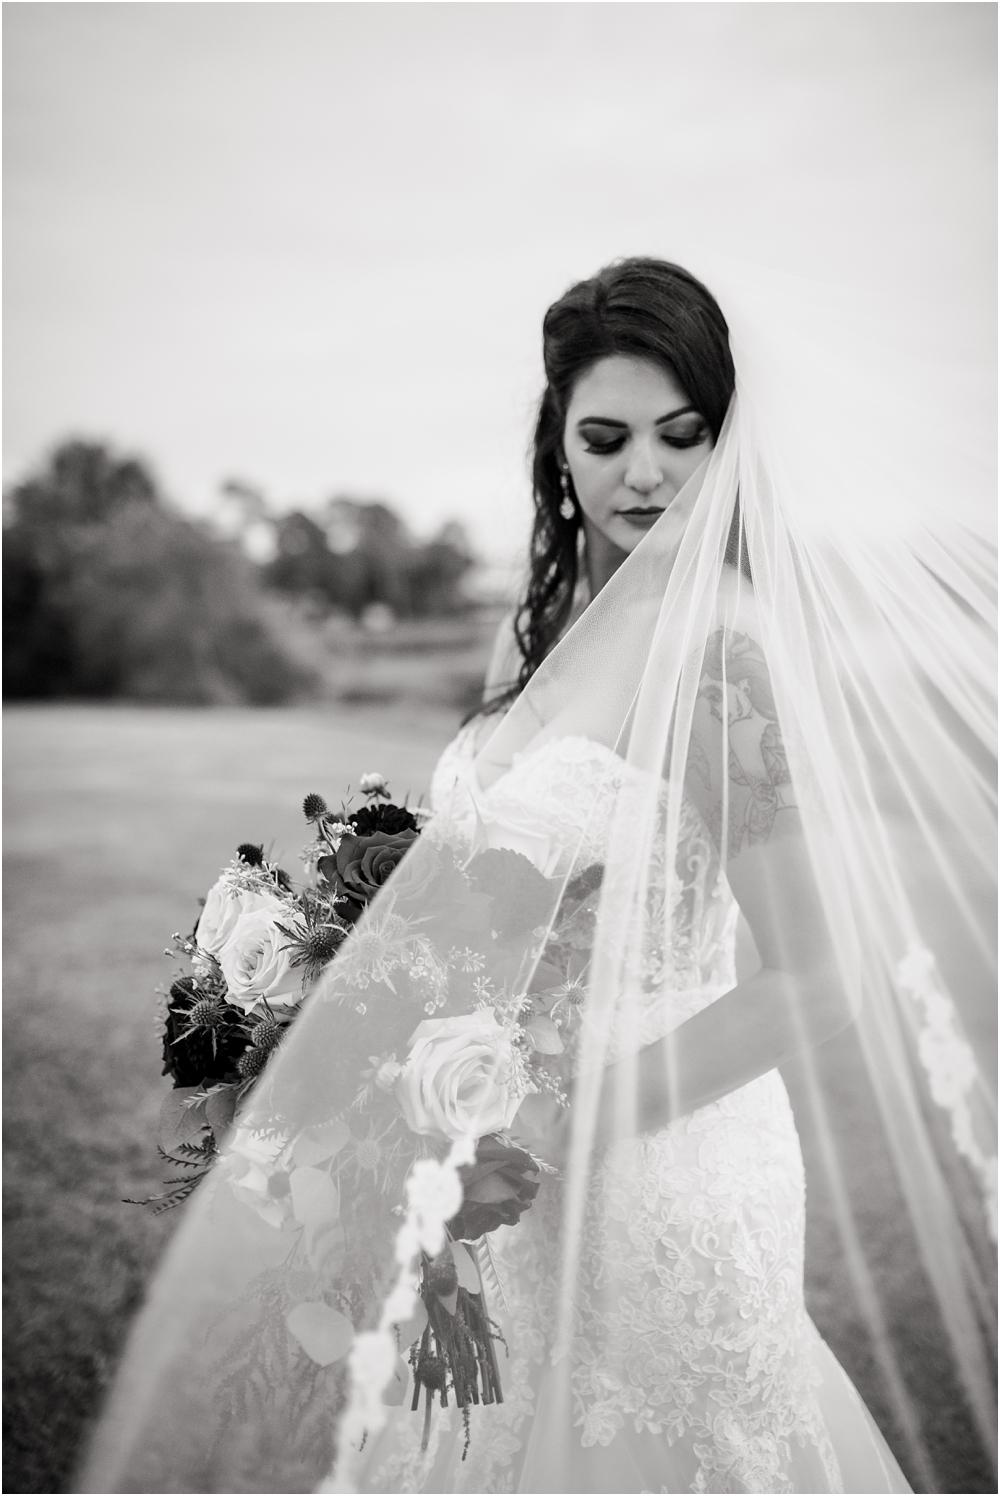 imhof-sheraton-panama-city-beach-florida-wedding-photographer-kiersten-grant-145.jpg